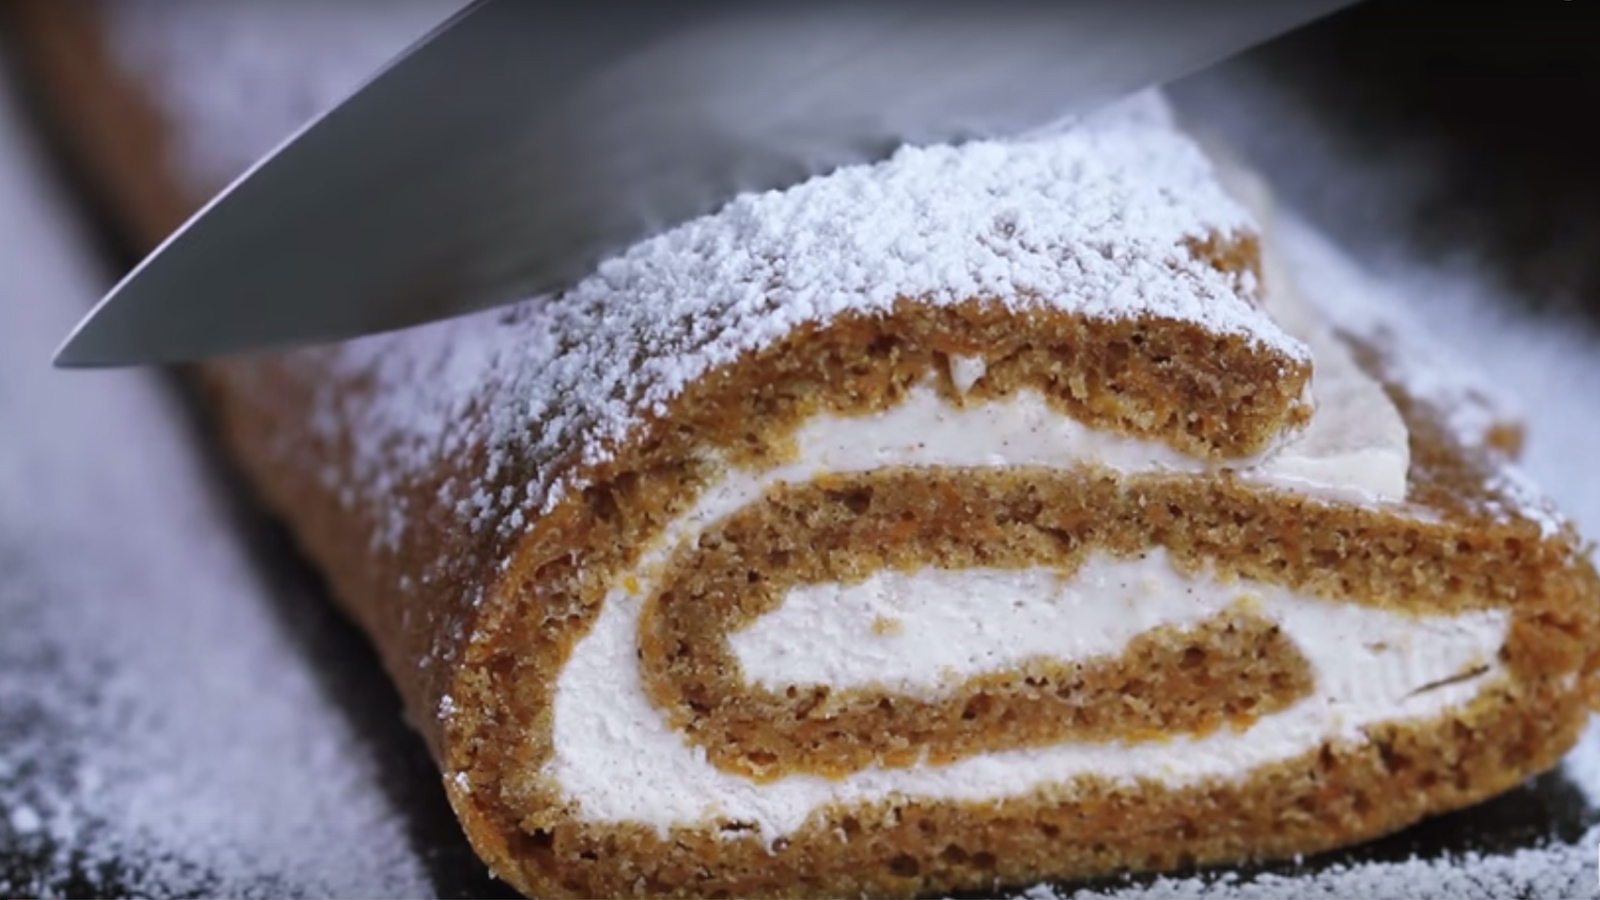 Foto: Skjermdump fra Youtube, Home Cooking Adventure